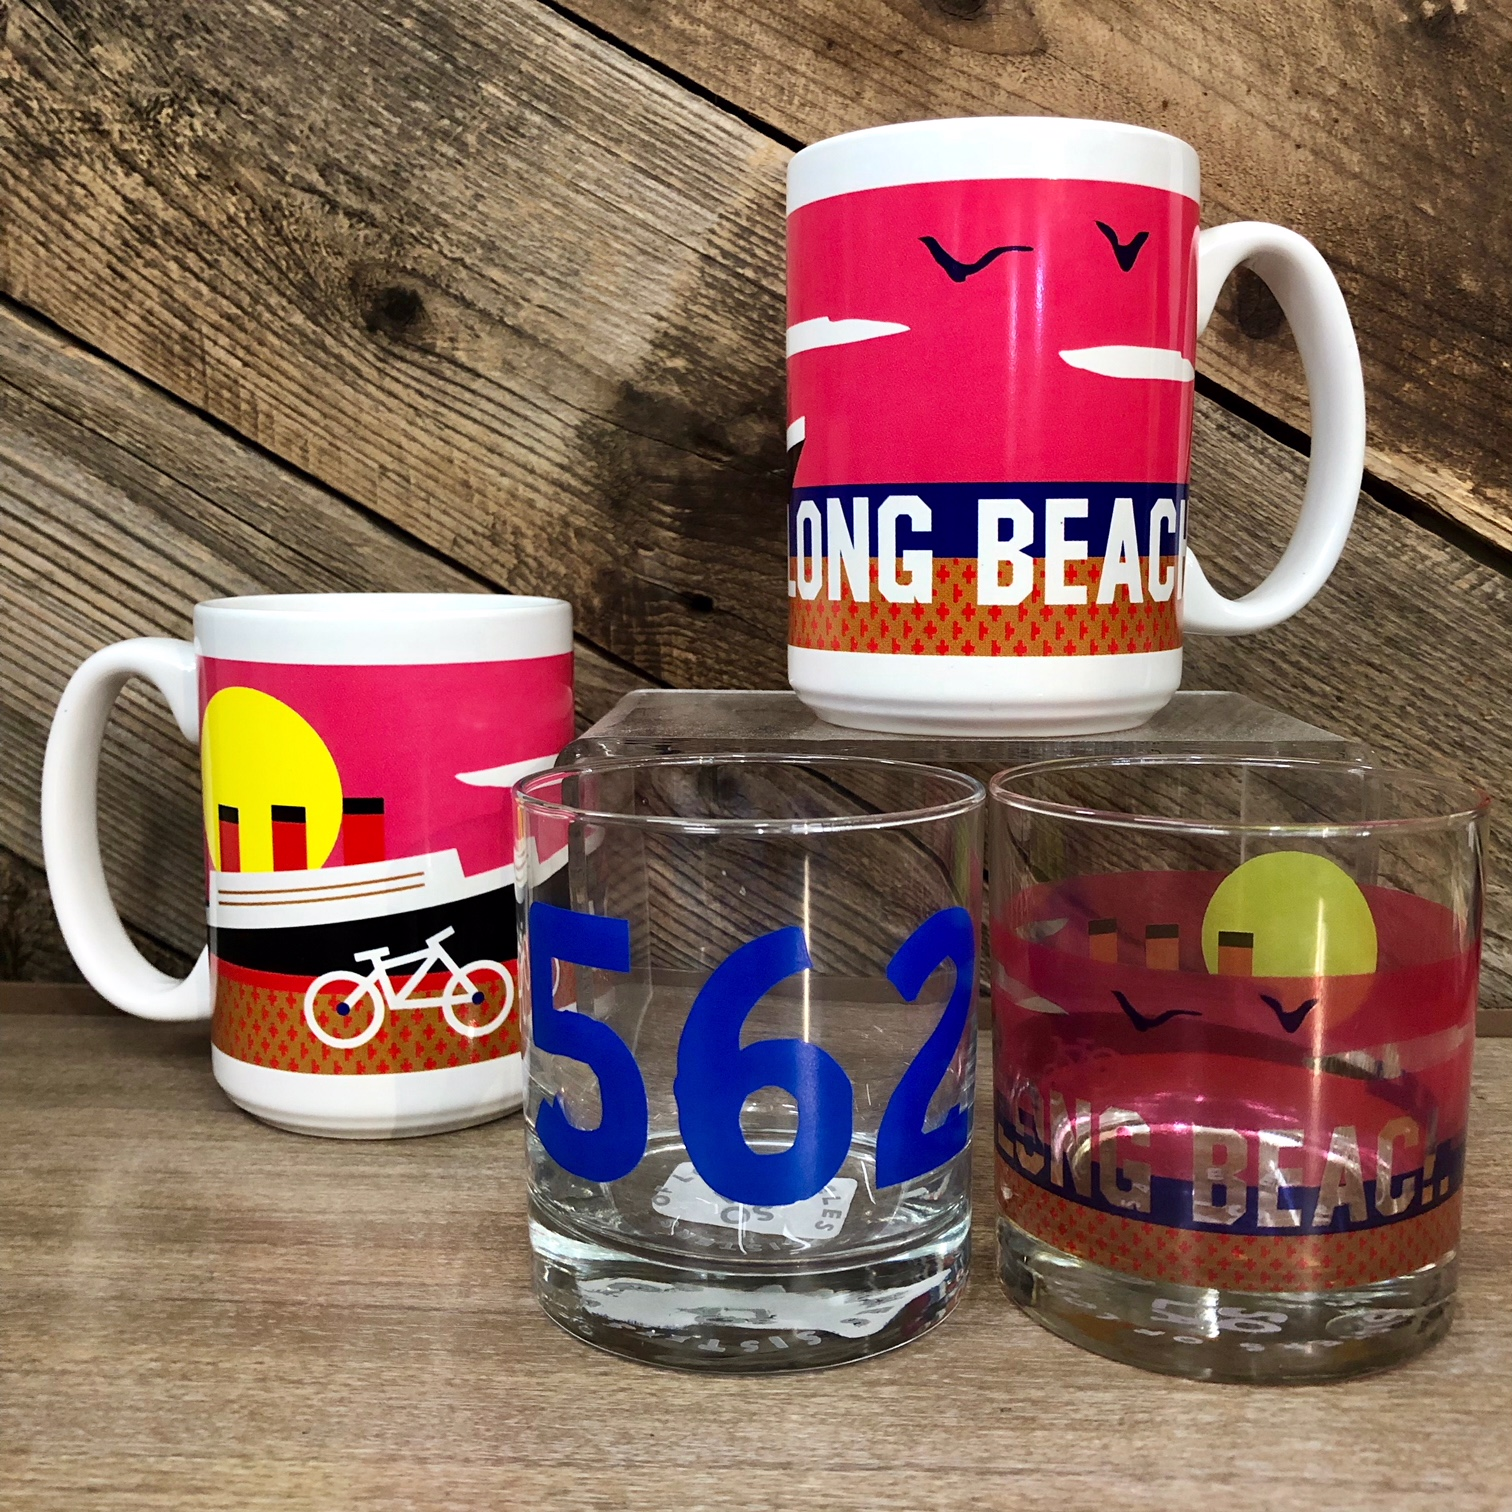 Long Beach Drinkware